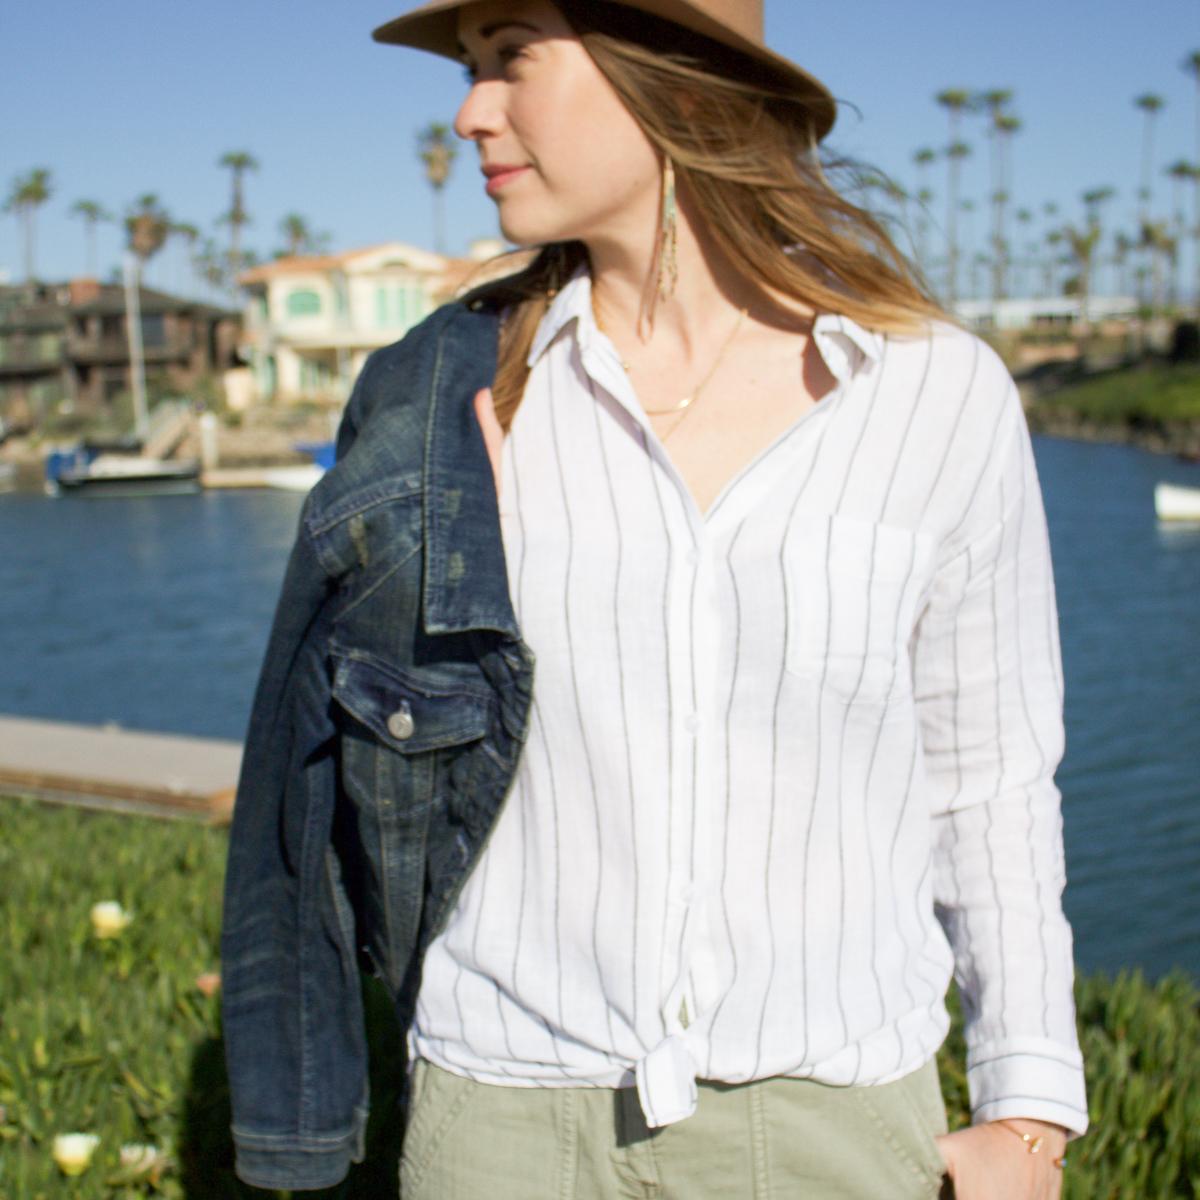 Trunk club for women, Rails button-up shirt, striped shirt, linen shirt, beach style, resort style, denim jacket, fringe earrings